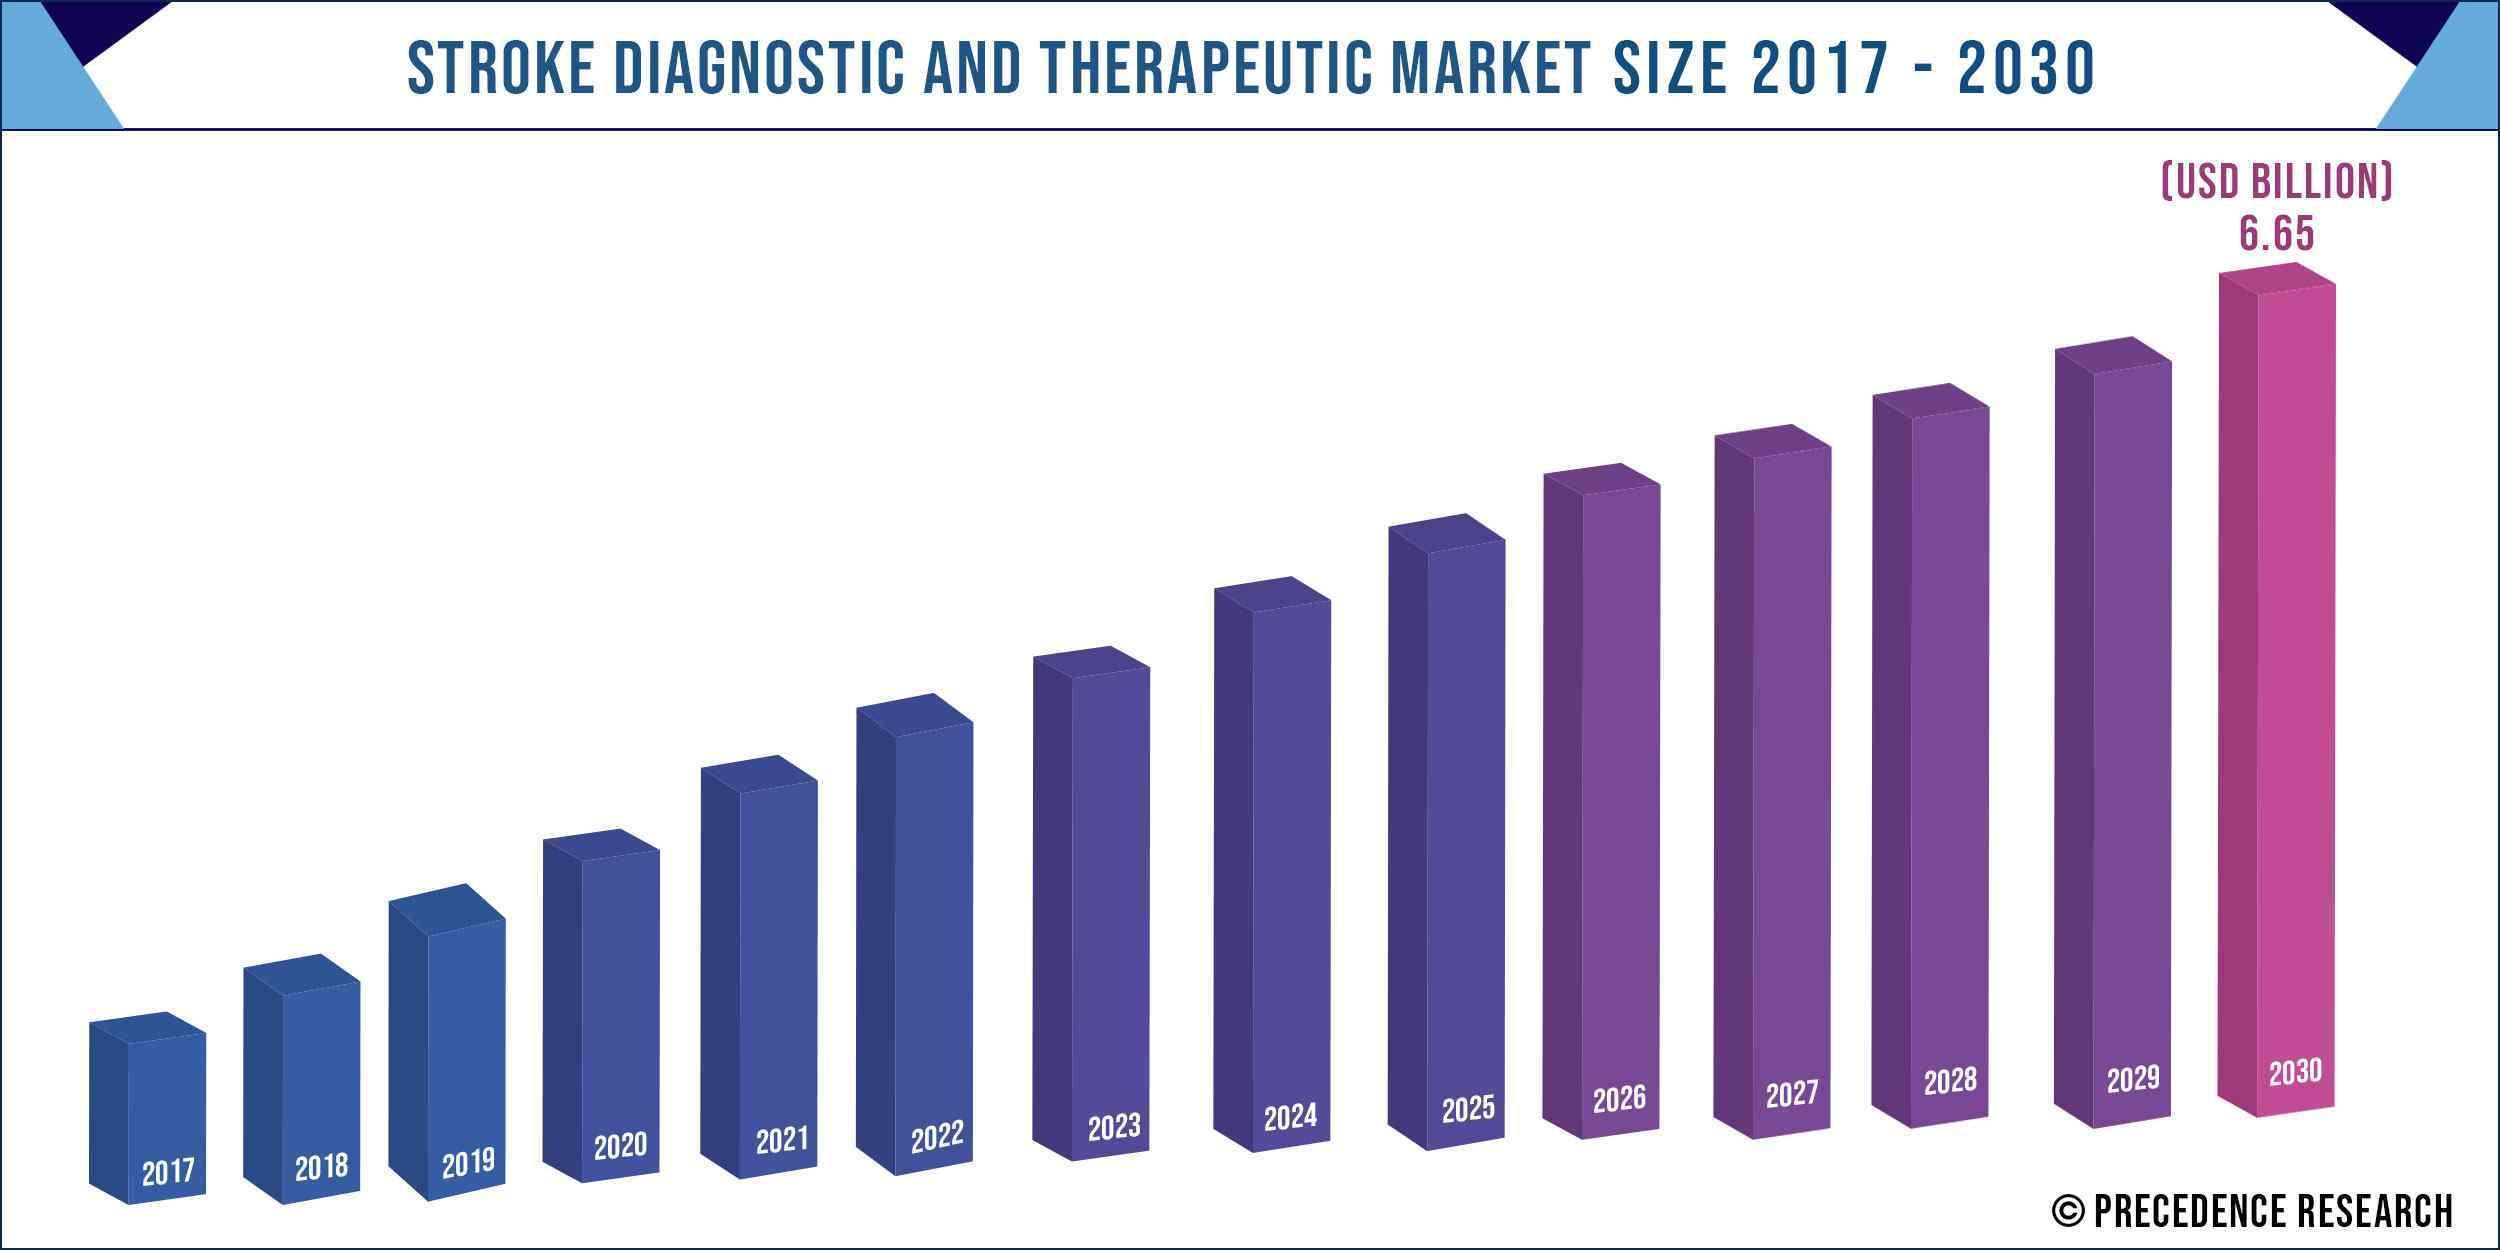 Stroke Diagnostic and Therapeutic Market Size 2017 to 2030